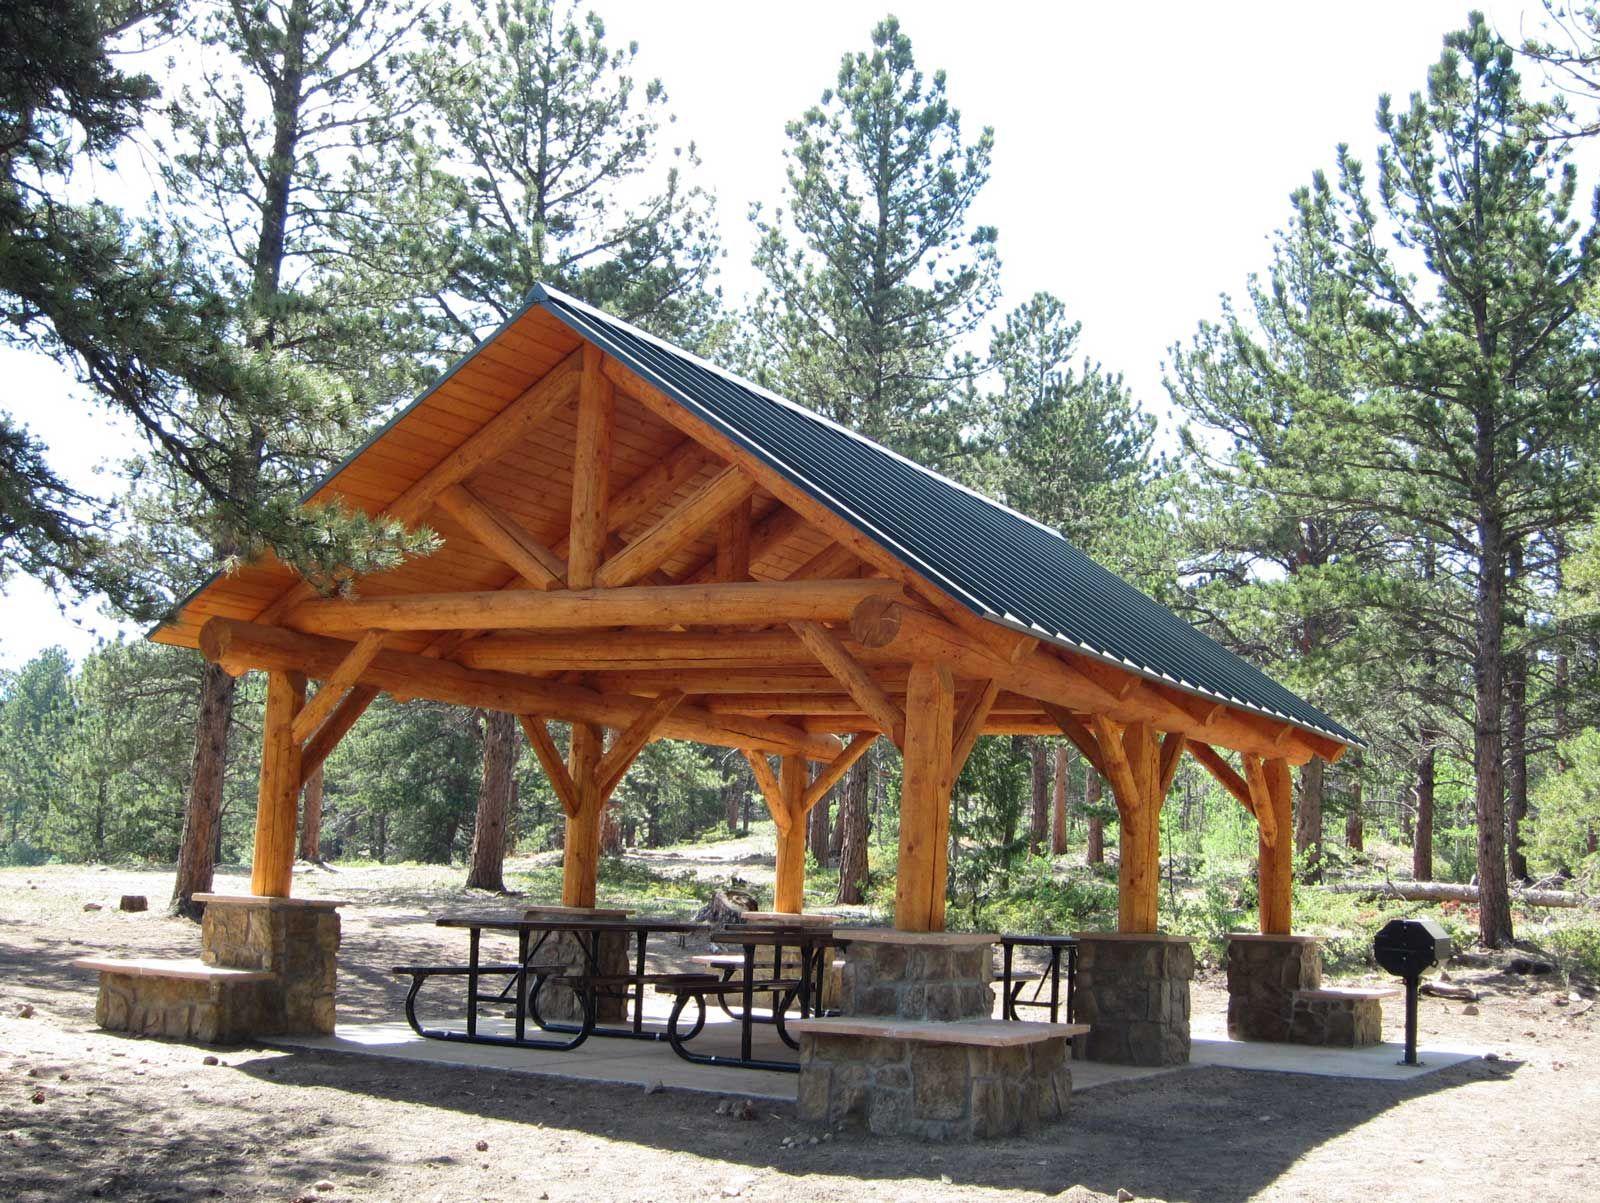 picnic shelter plans | Picnic Shelter Now Open | camp ...